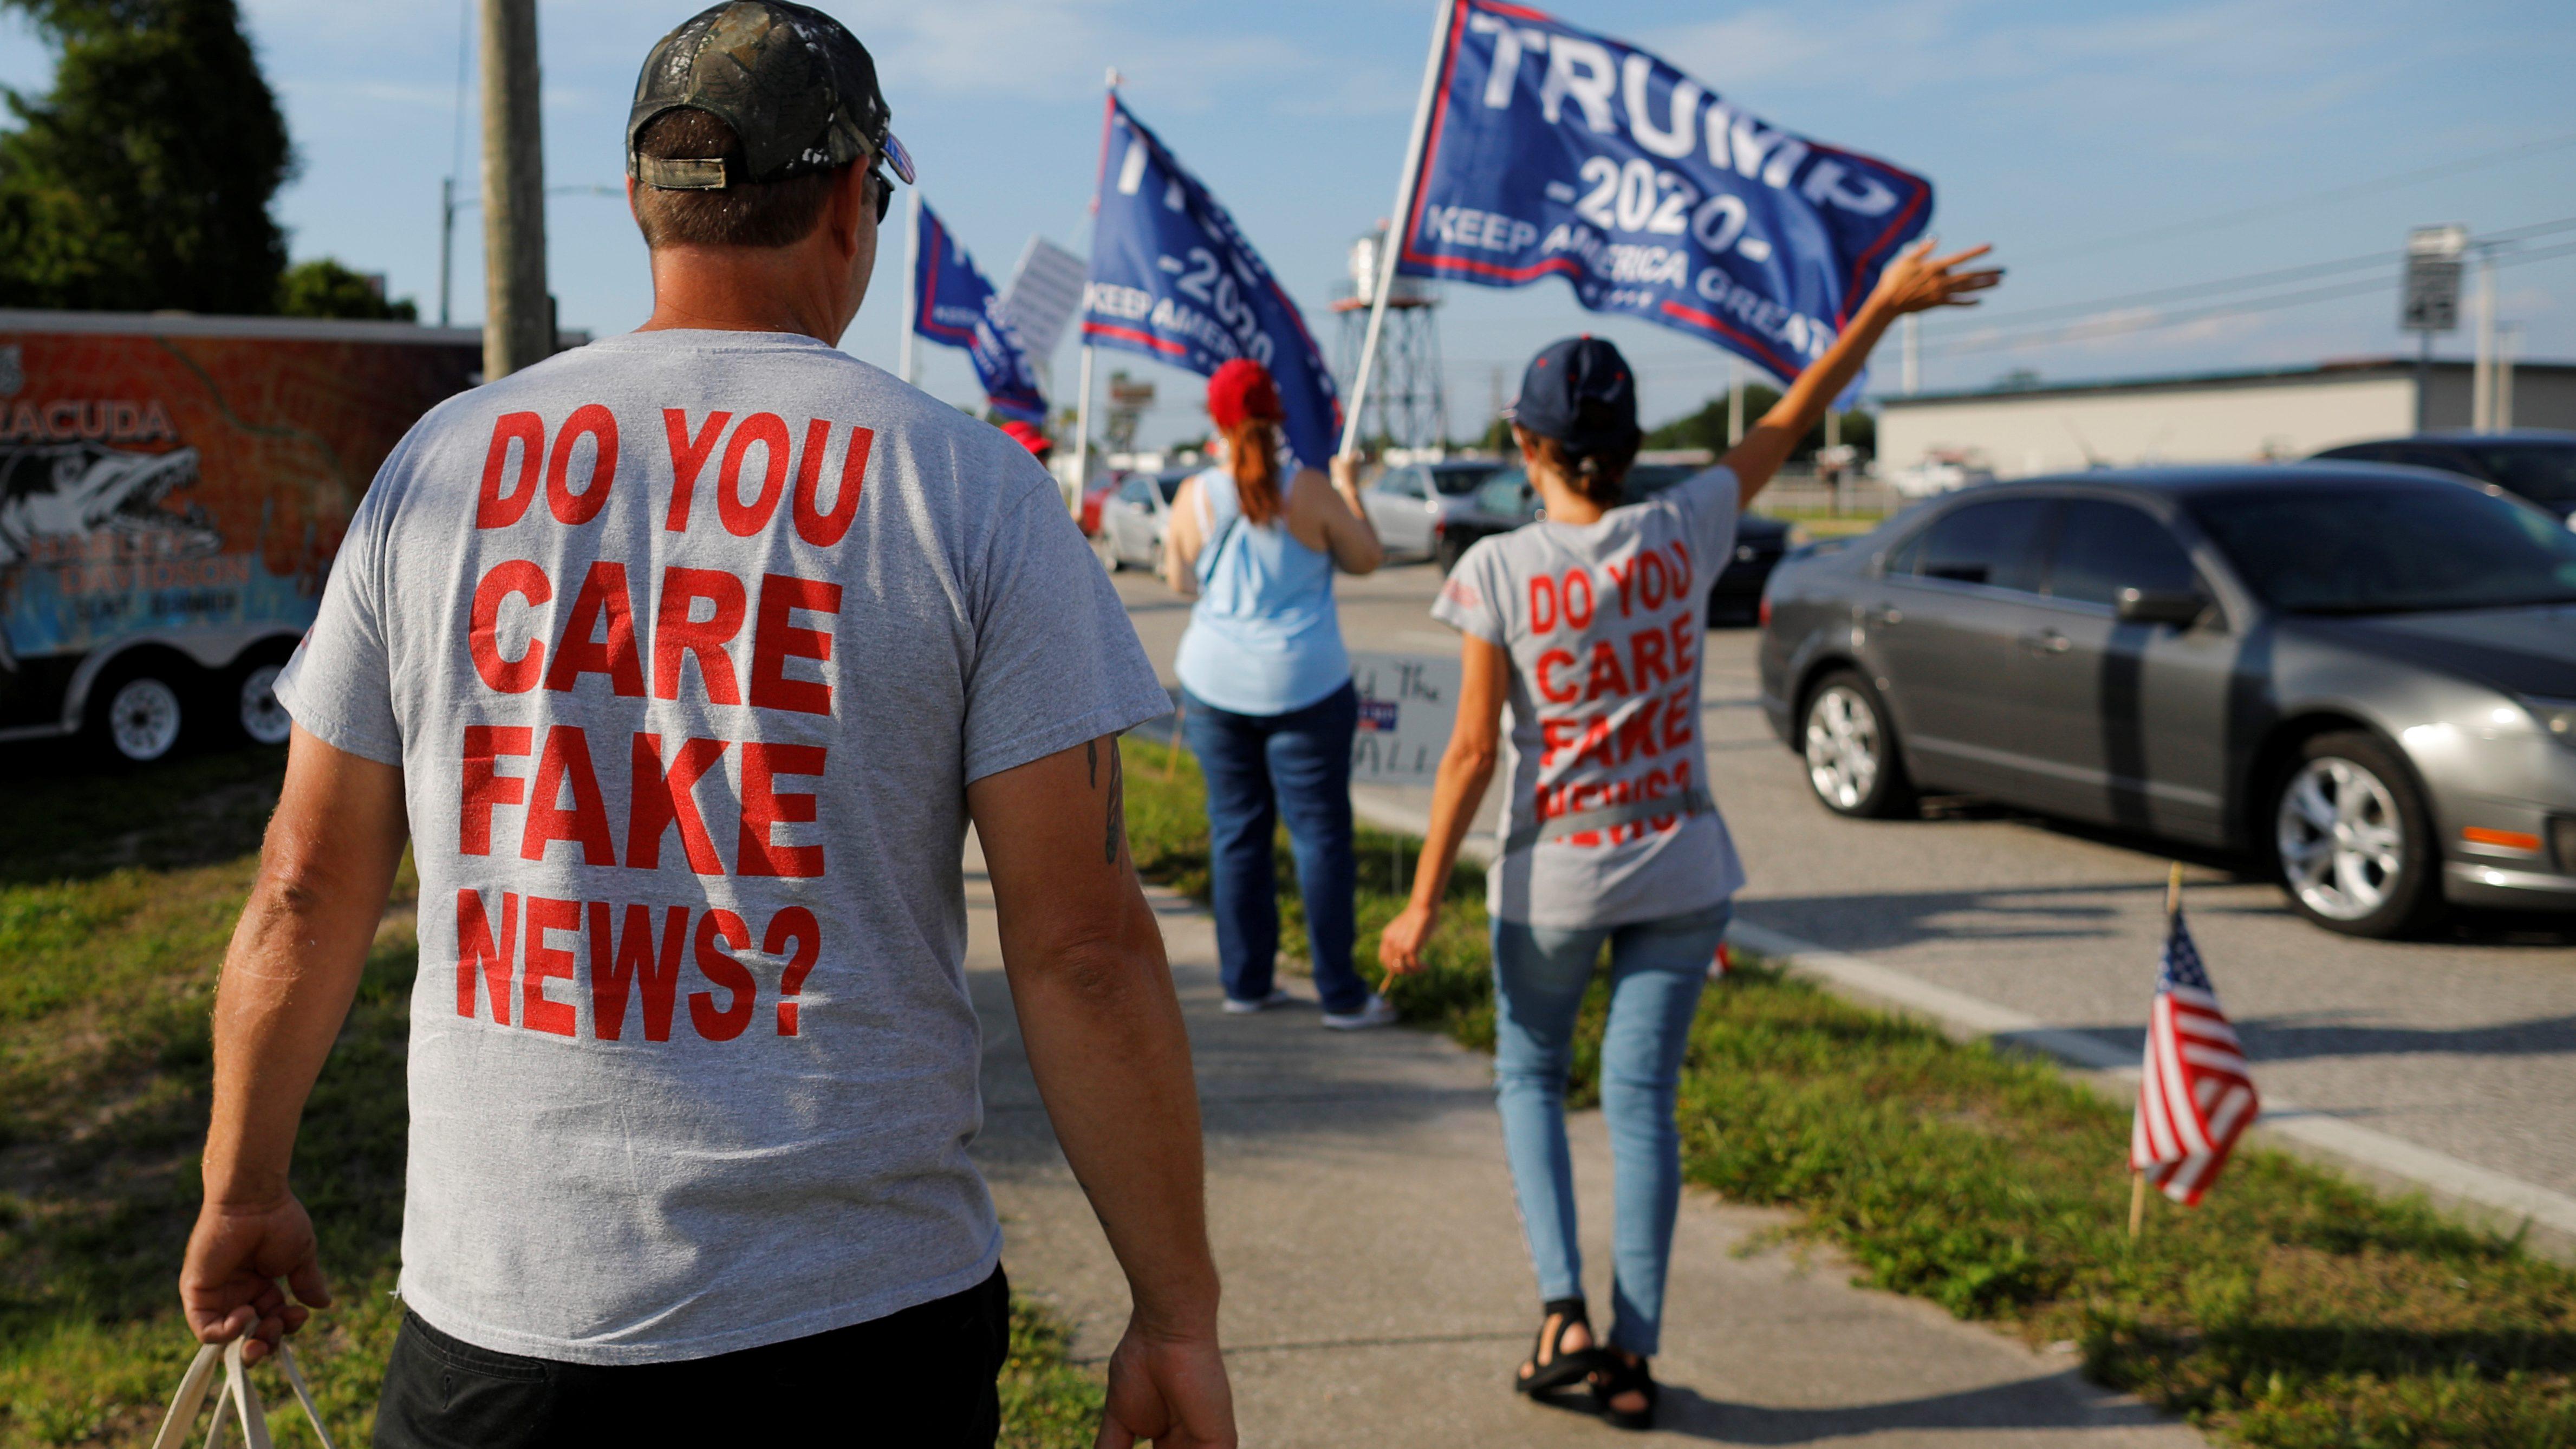 A man wears a t-shirt saying Do you care, fake news?